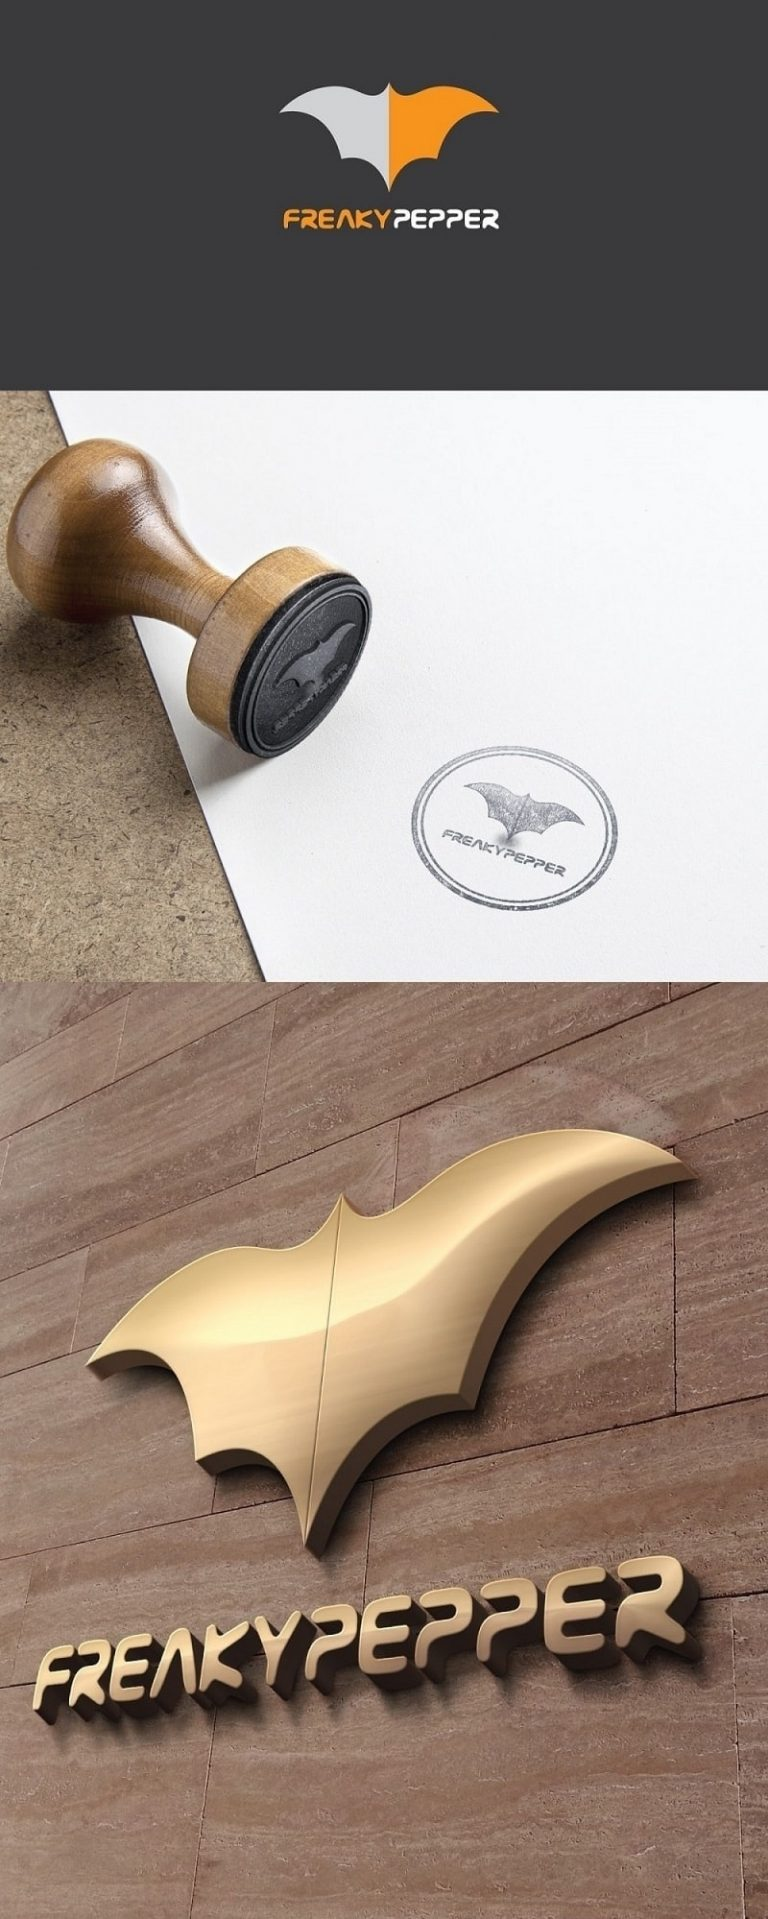 logo-design-min